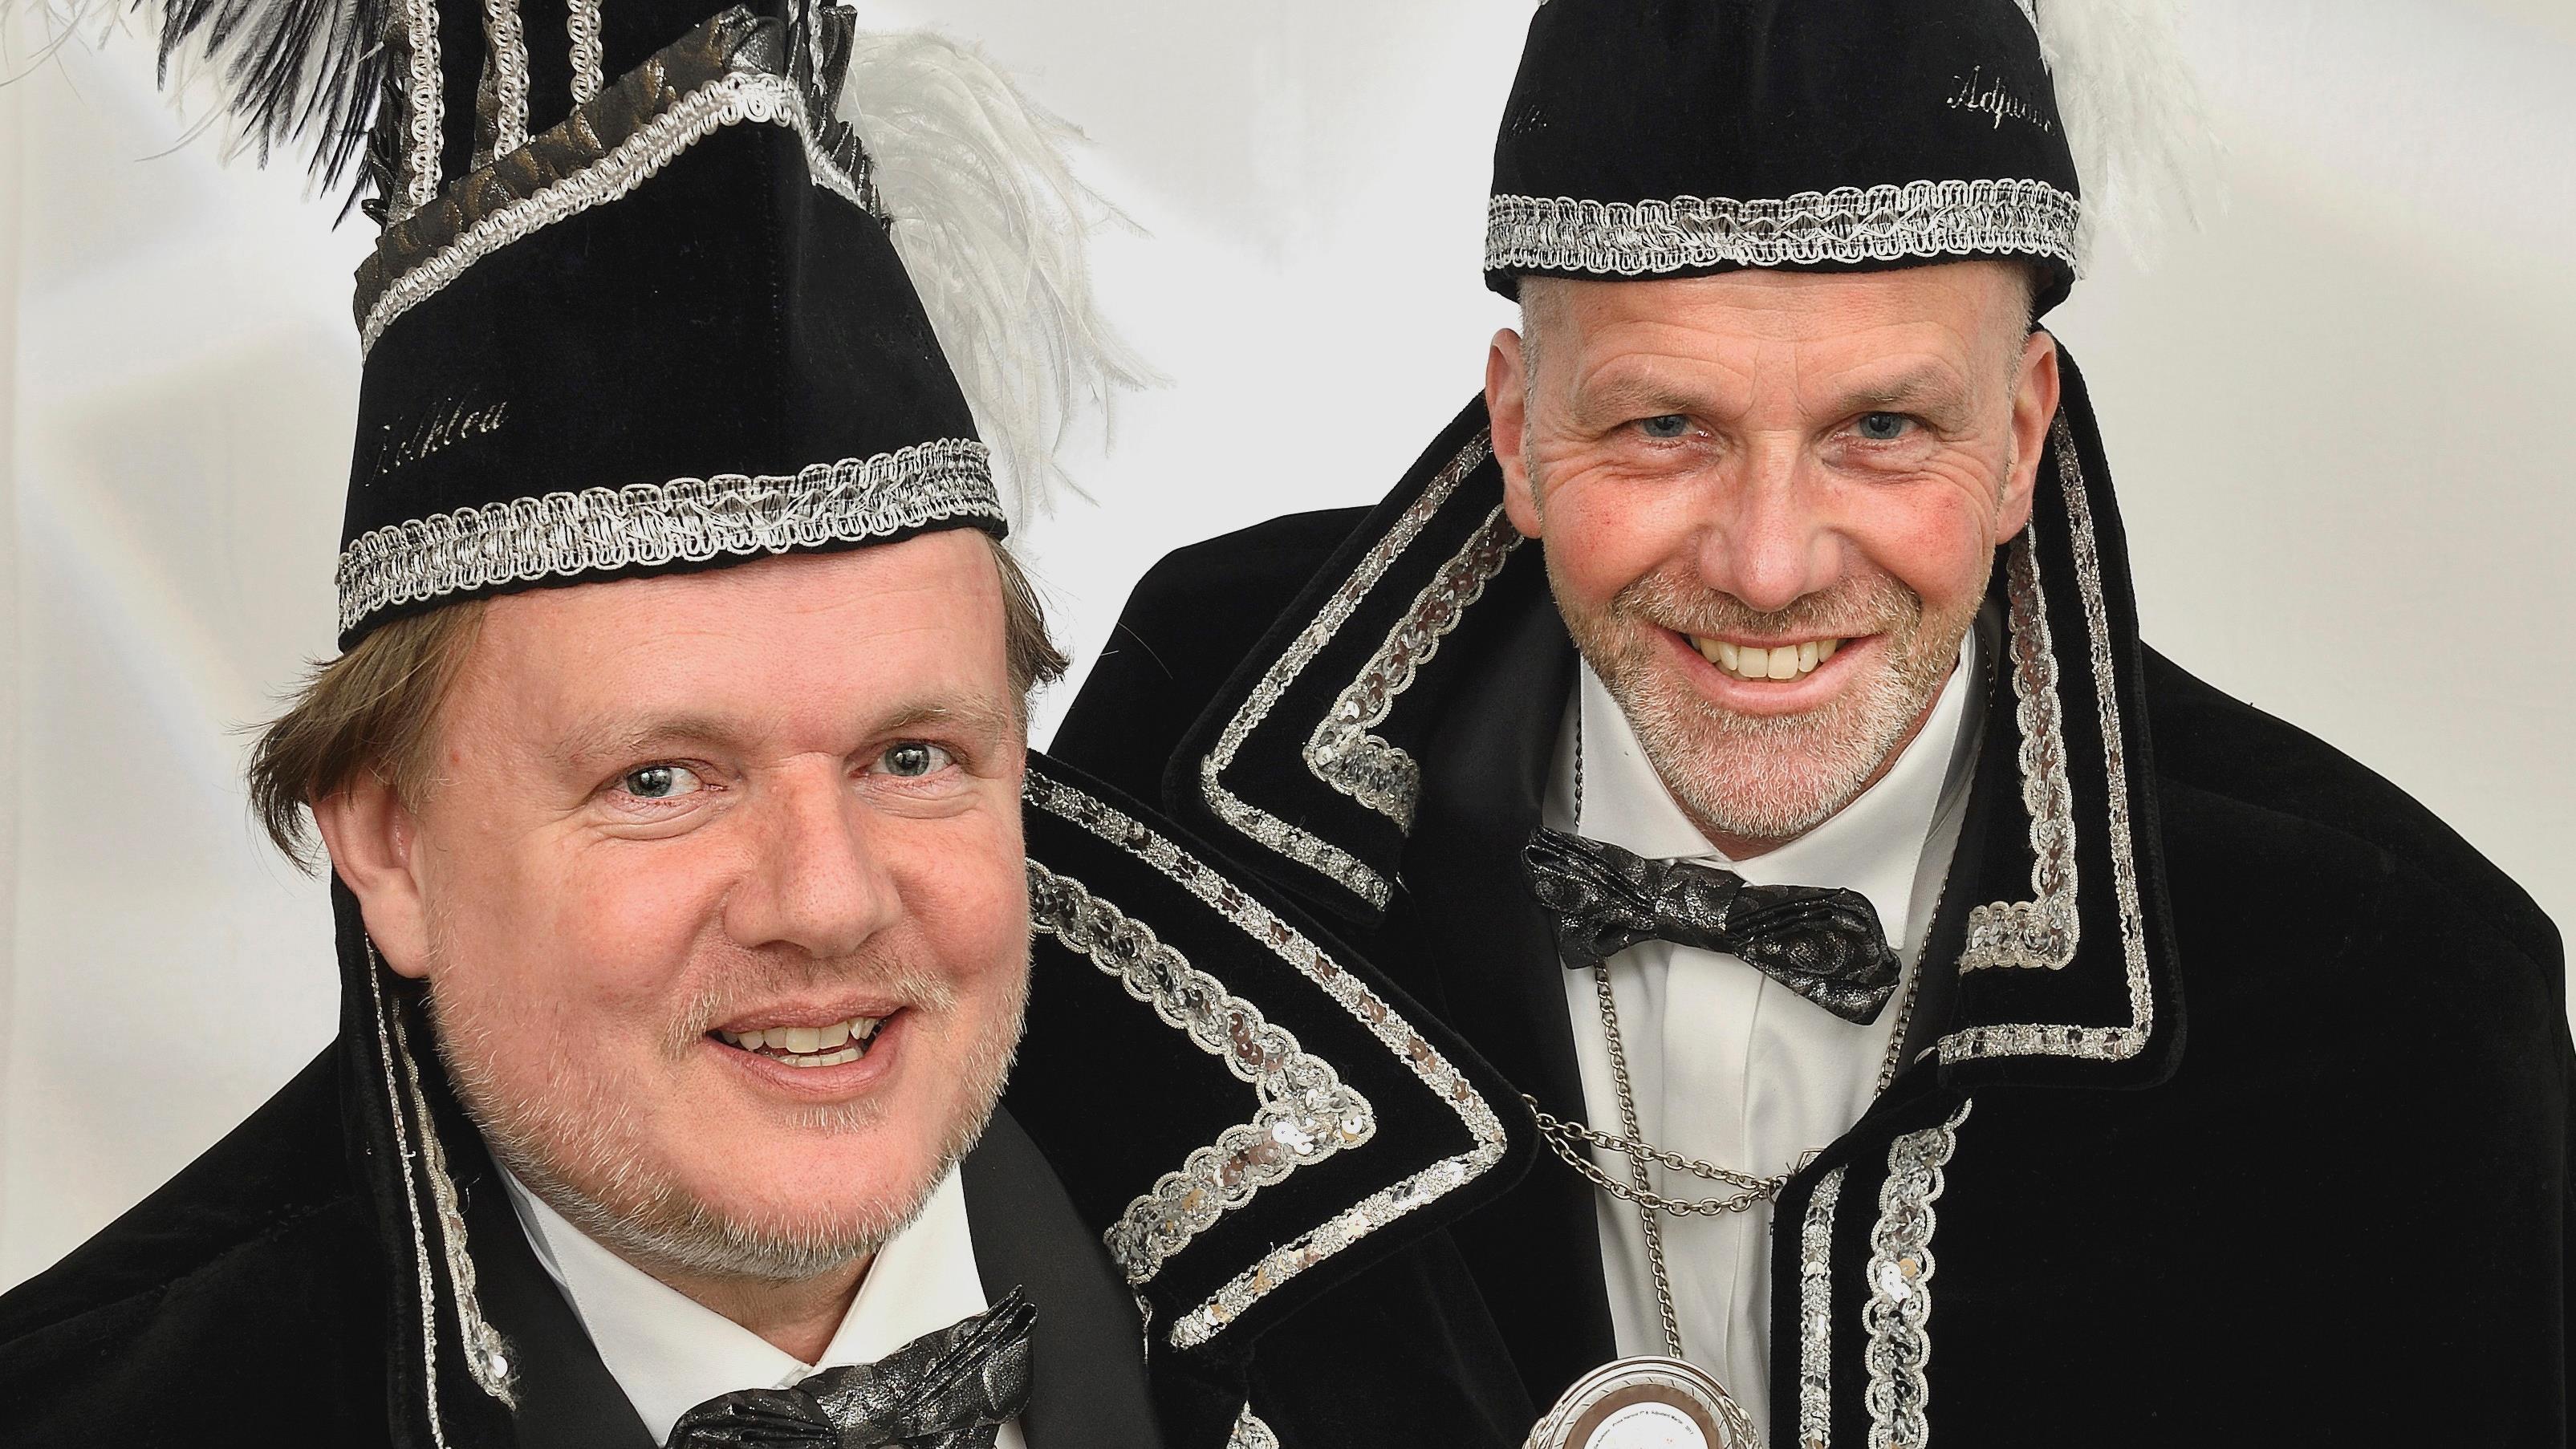 Harold Weerkamp prins van De Kolkleu uit Hertme